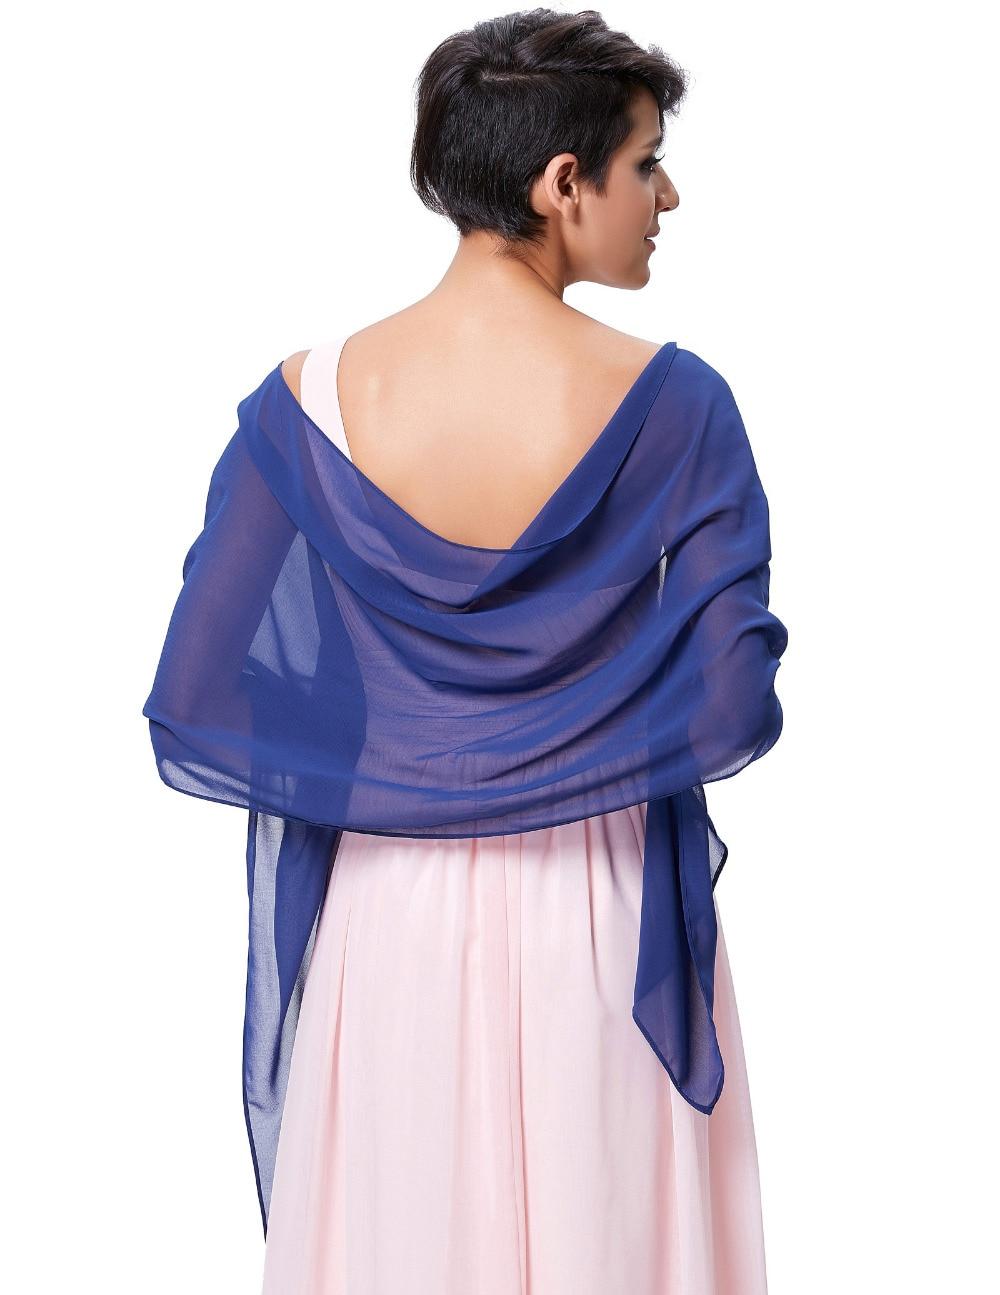 Women   Scarves     Wraps   2017 New Fashion Shawl Neckerchief Bandana Hijab Foulard Solid Royal Blue Wine Chiffon   Scarf   Bufandas